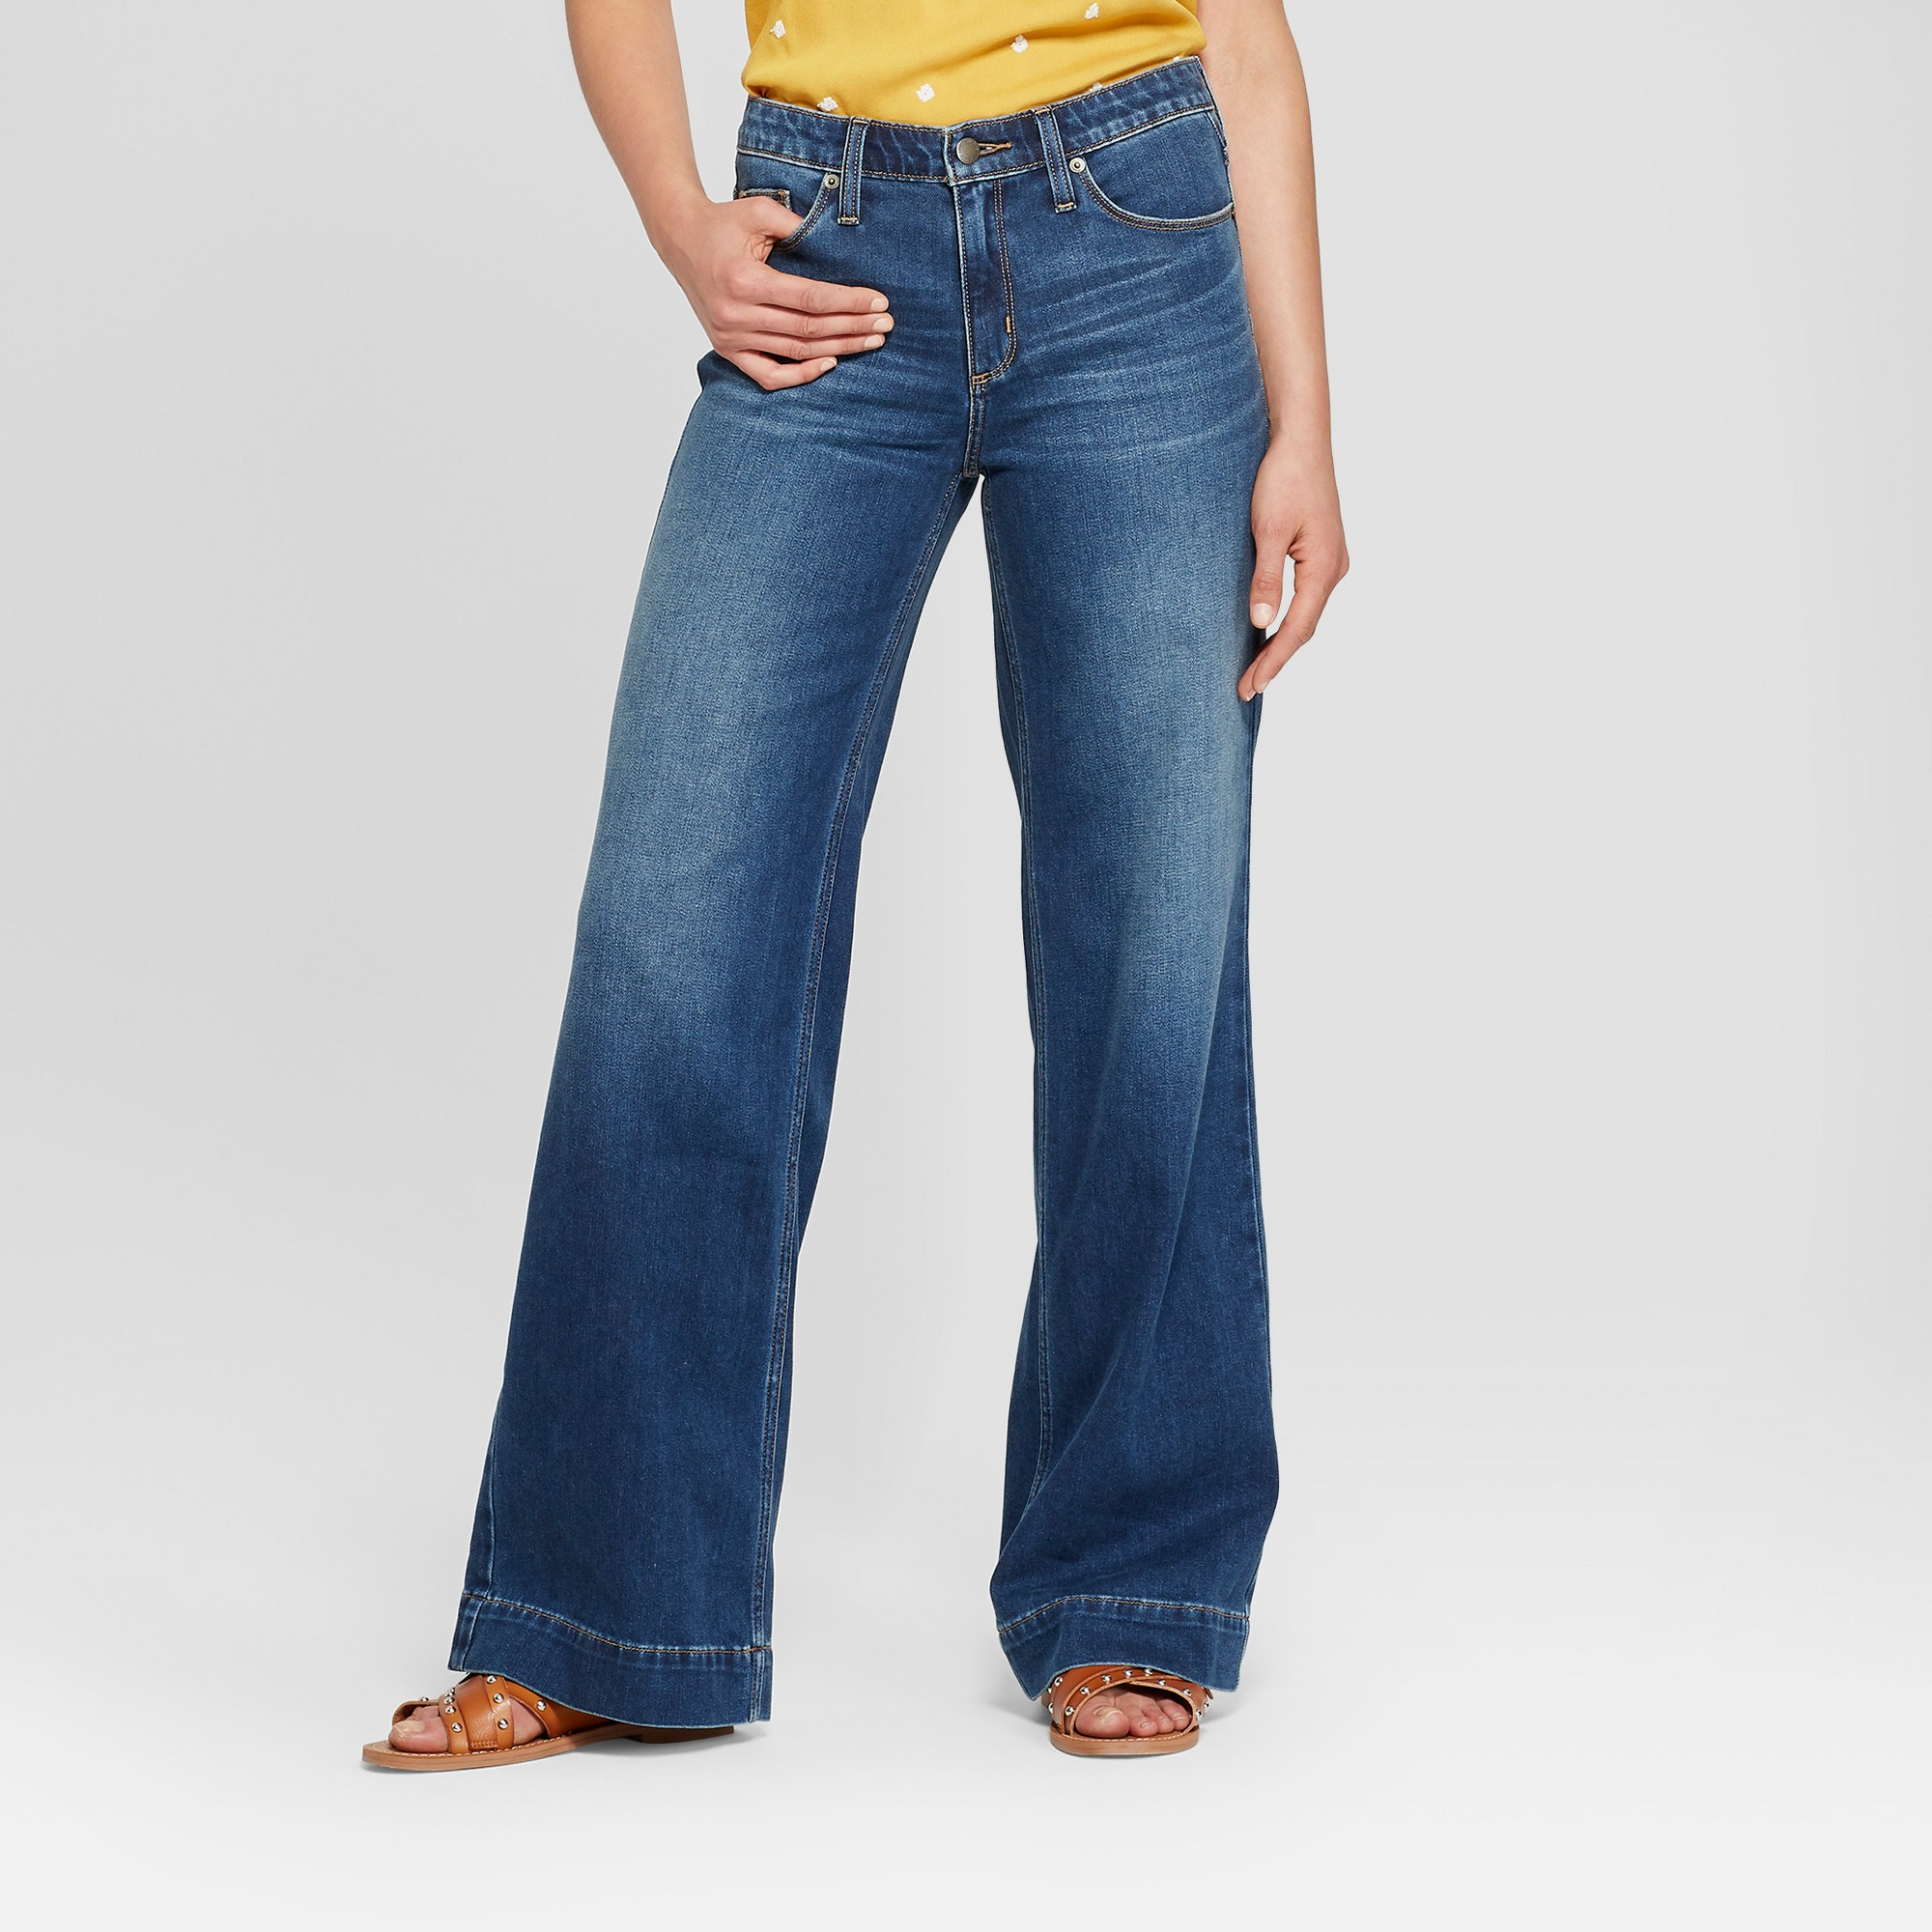 f75f66d0f7dac Women's High-Rise Wide Leg Jeans - Universal Thread Medium Wash 00 Short,  Blue